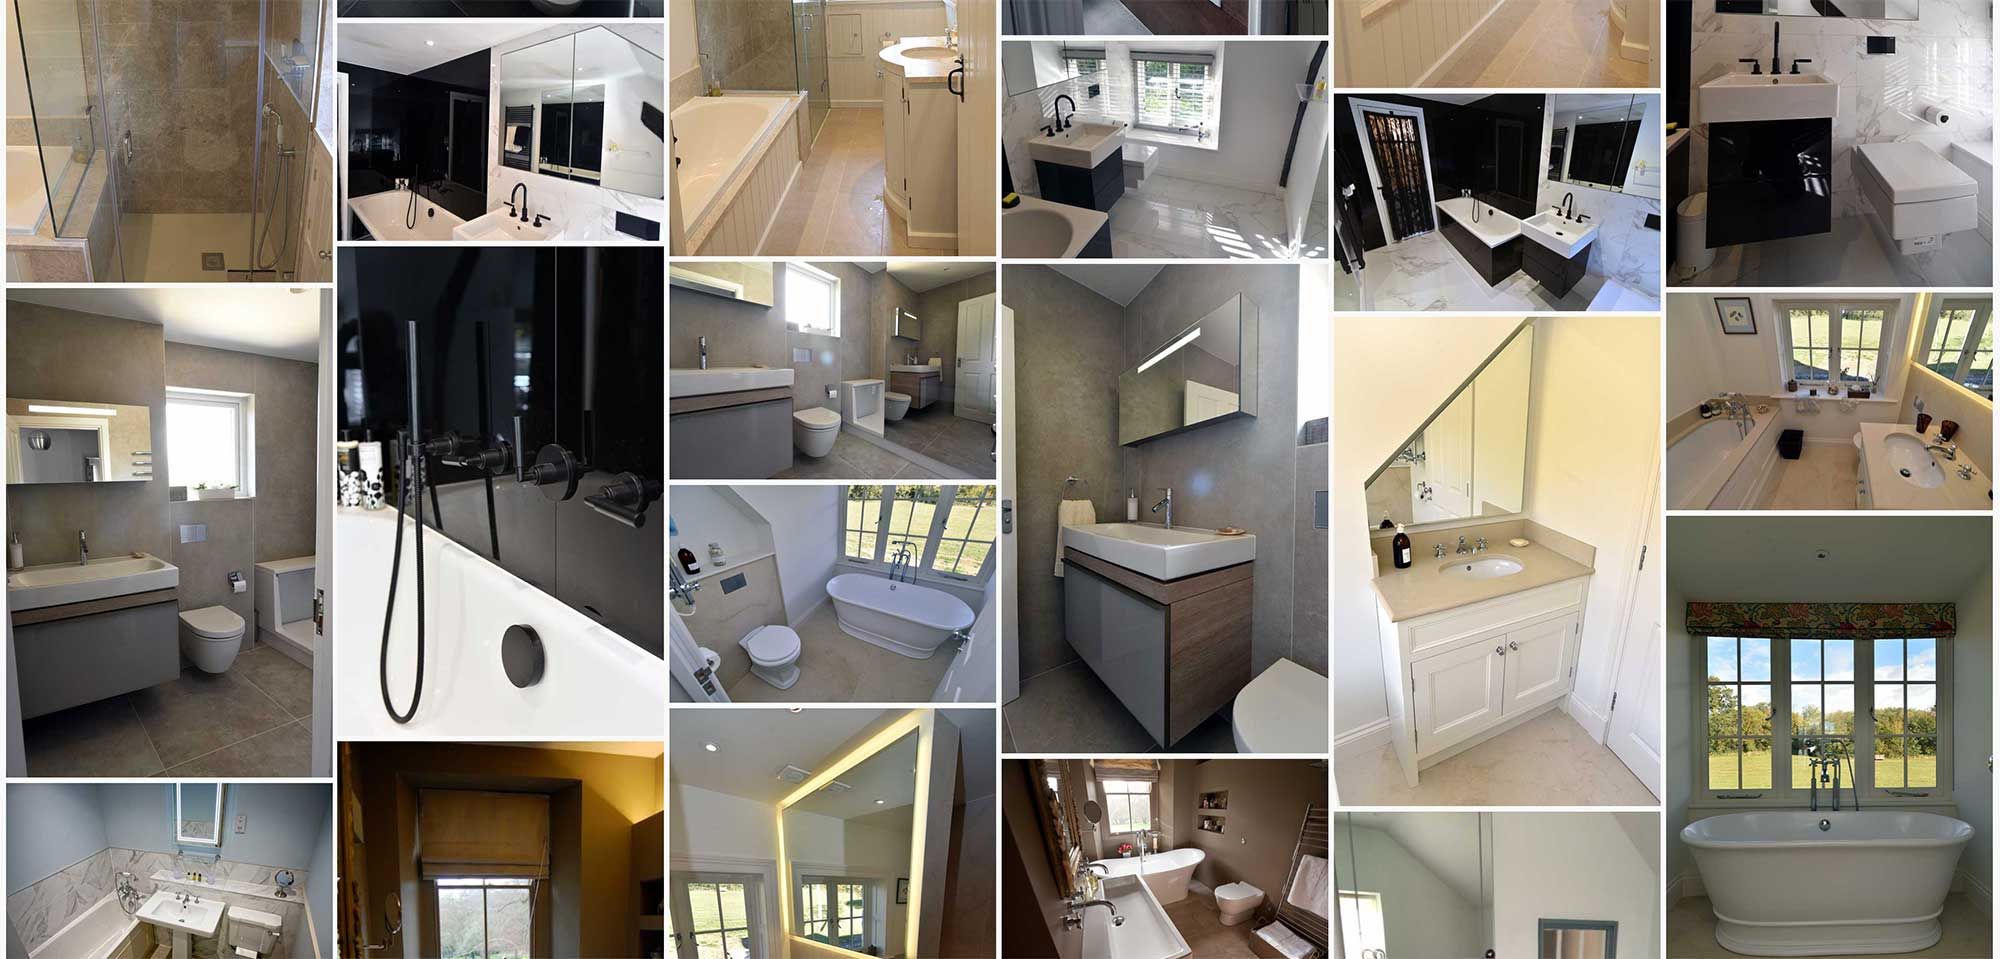 Bathroom inspiration gallery